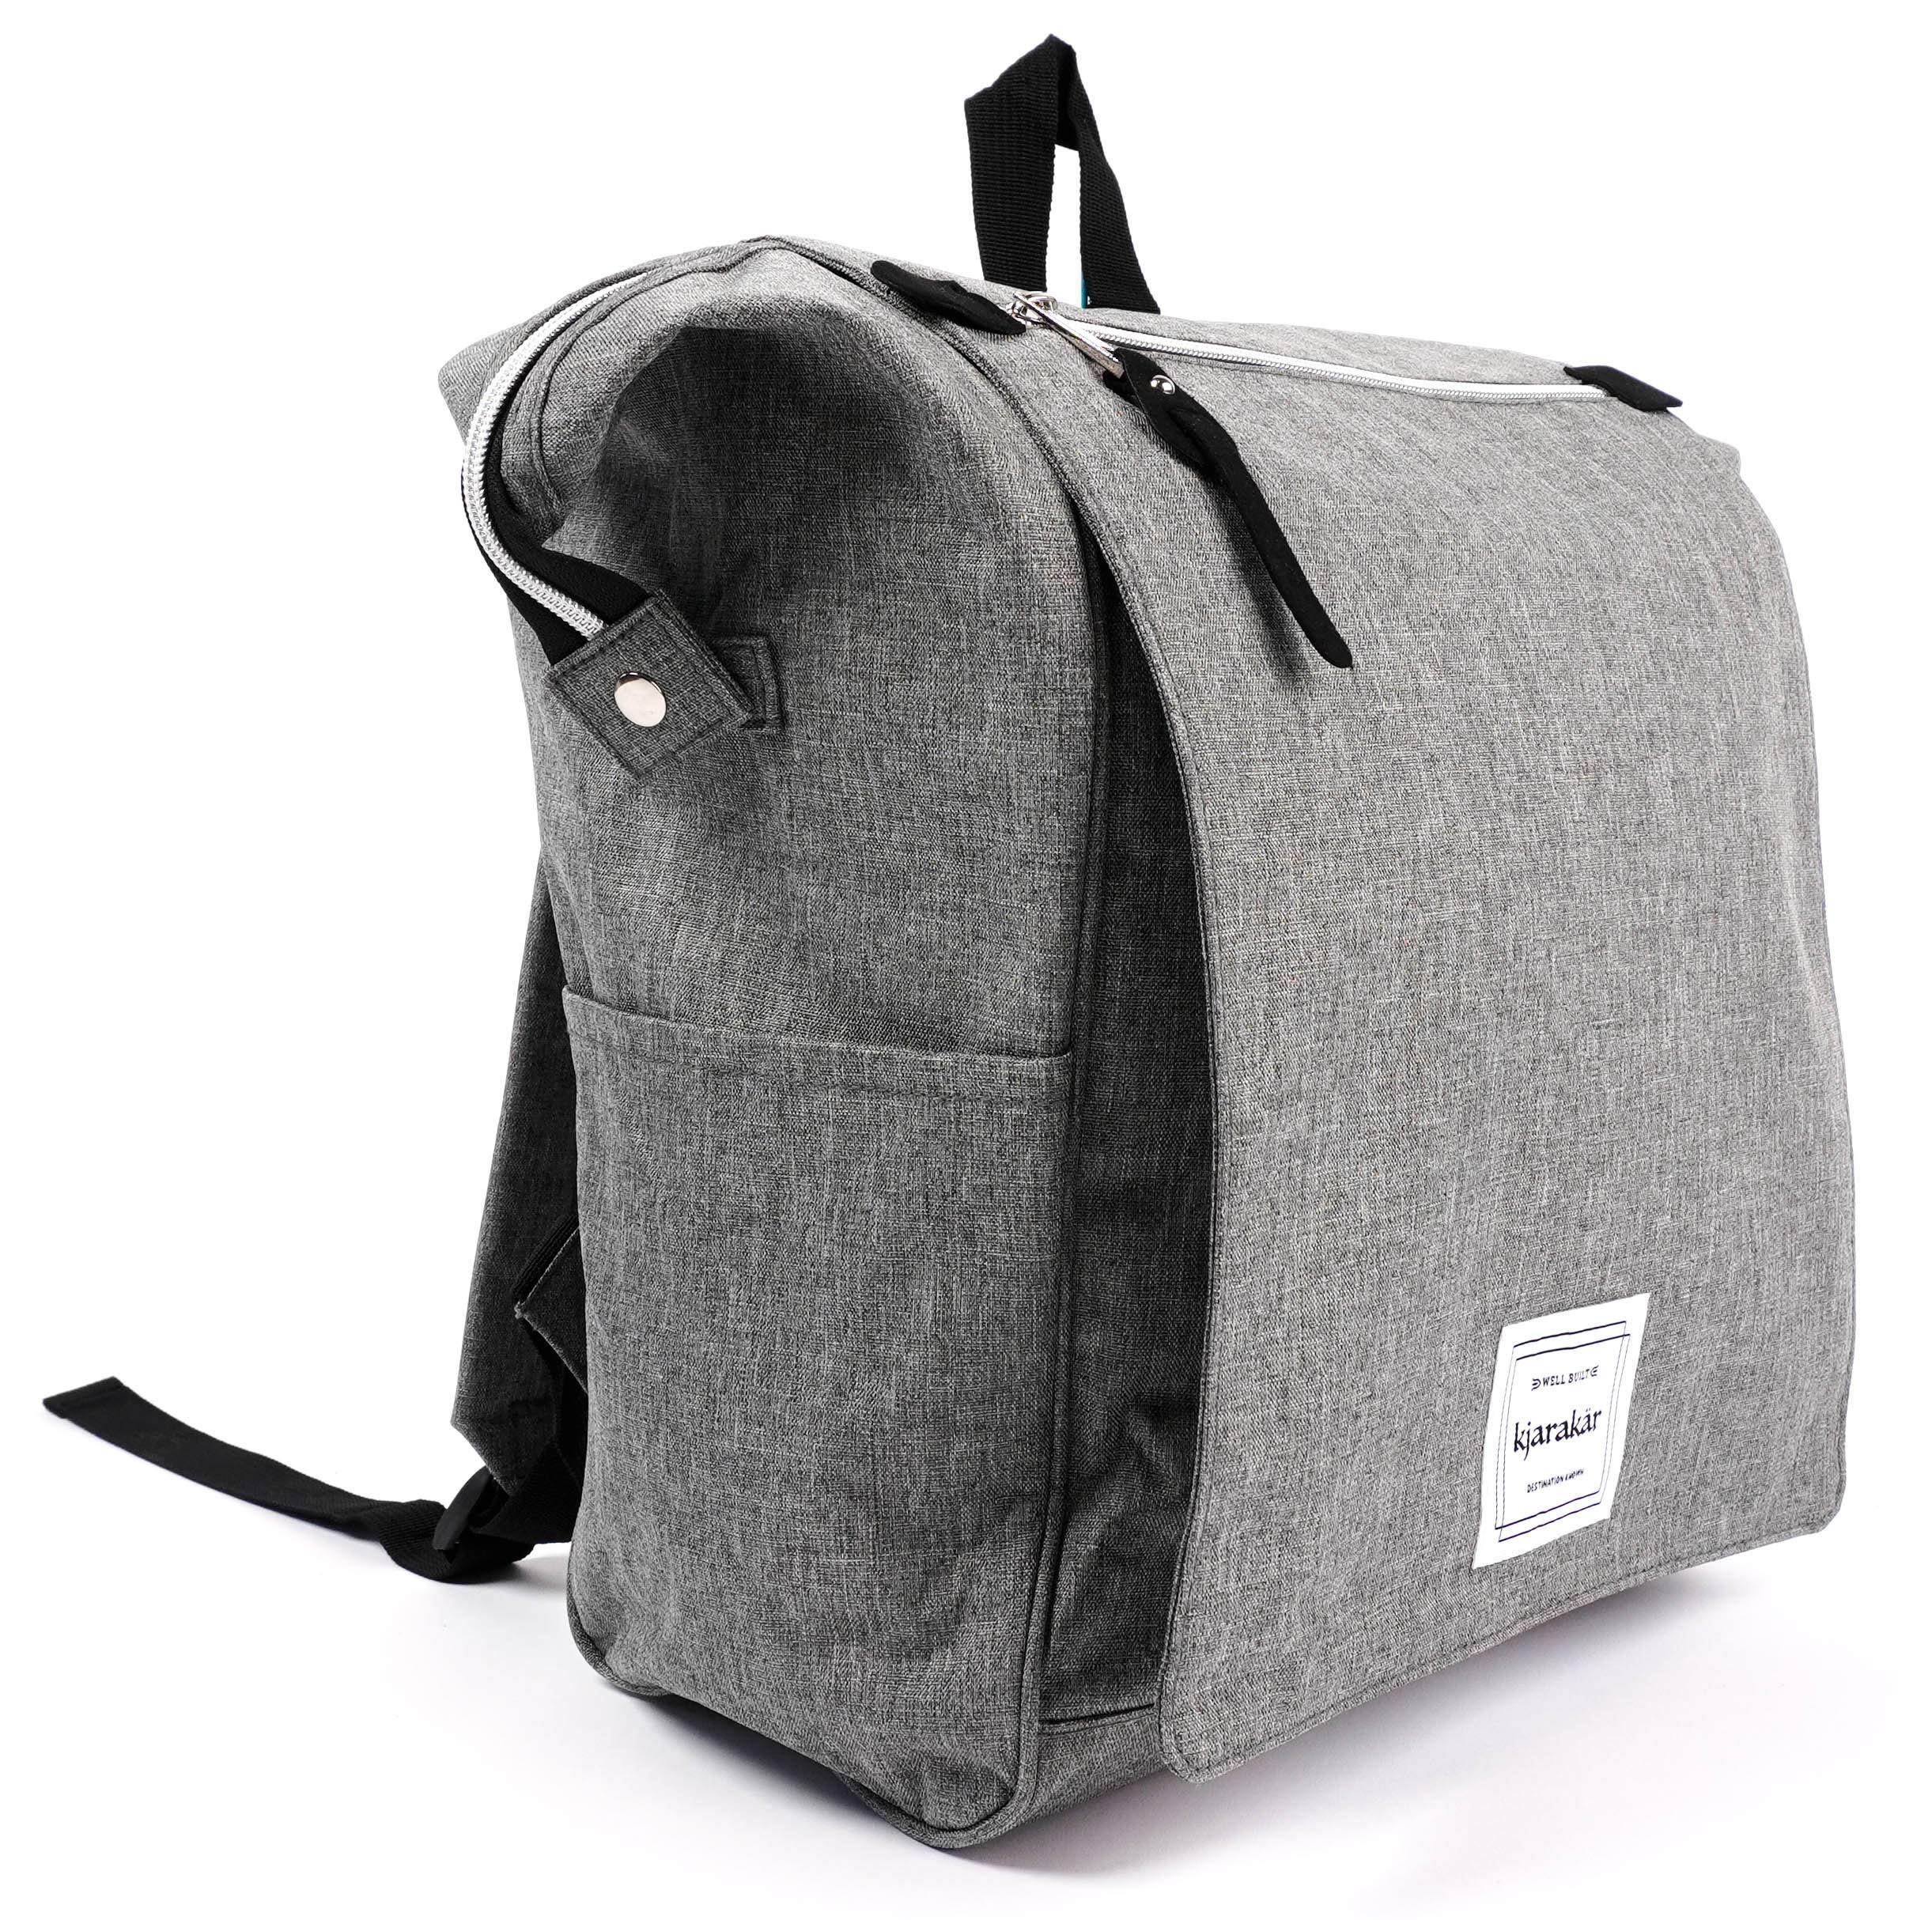 86fd4fc2f4a Kaukko Bags - KJARAKÄR Backpack Best Gift Women